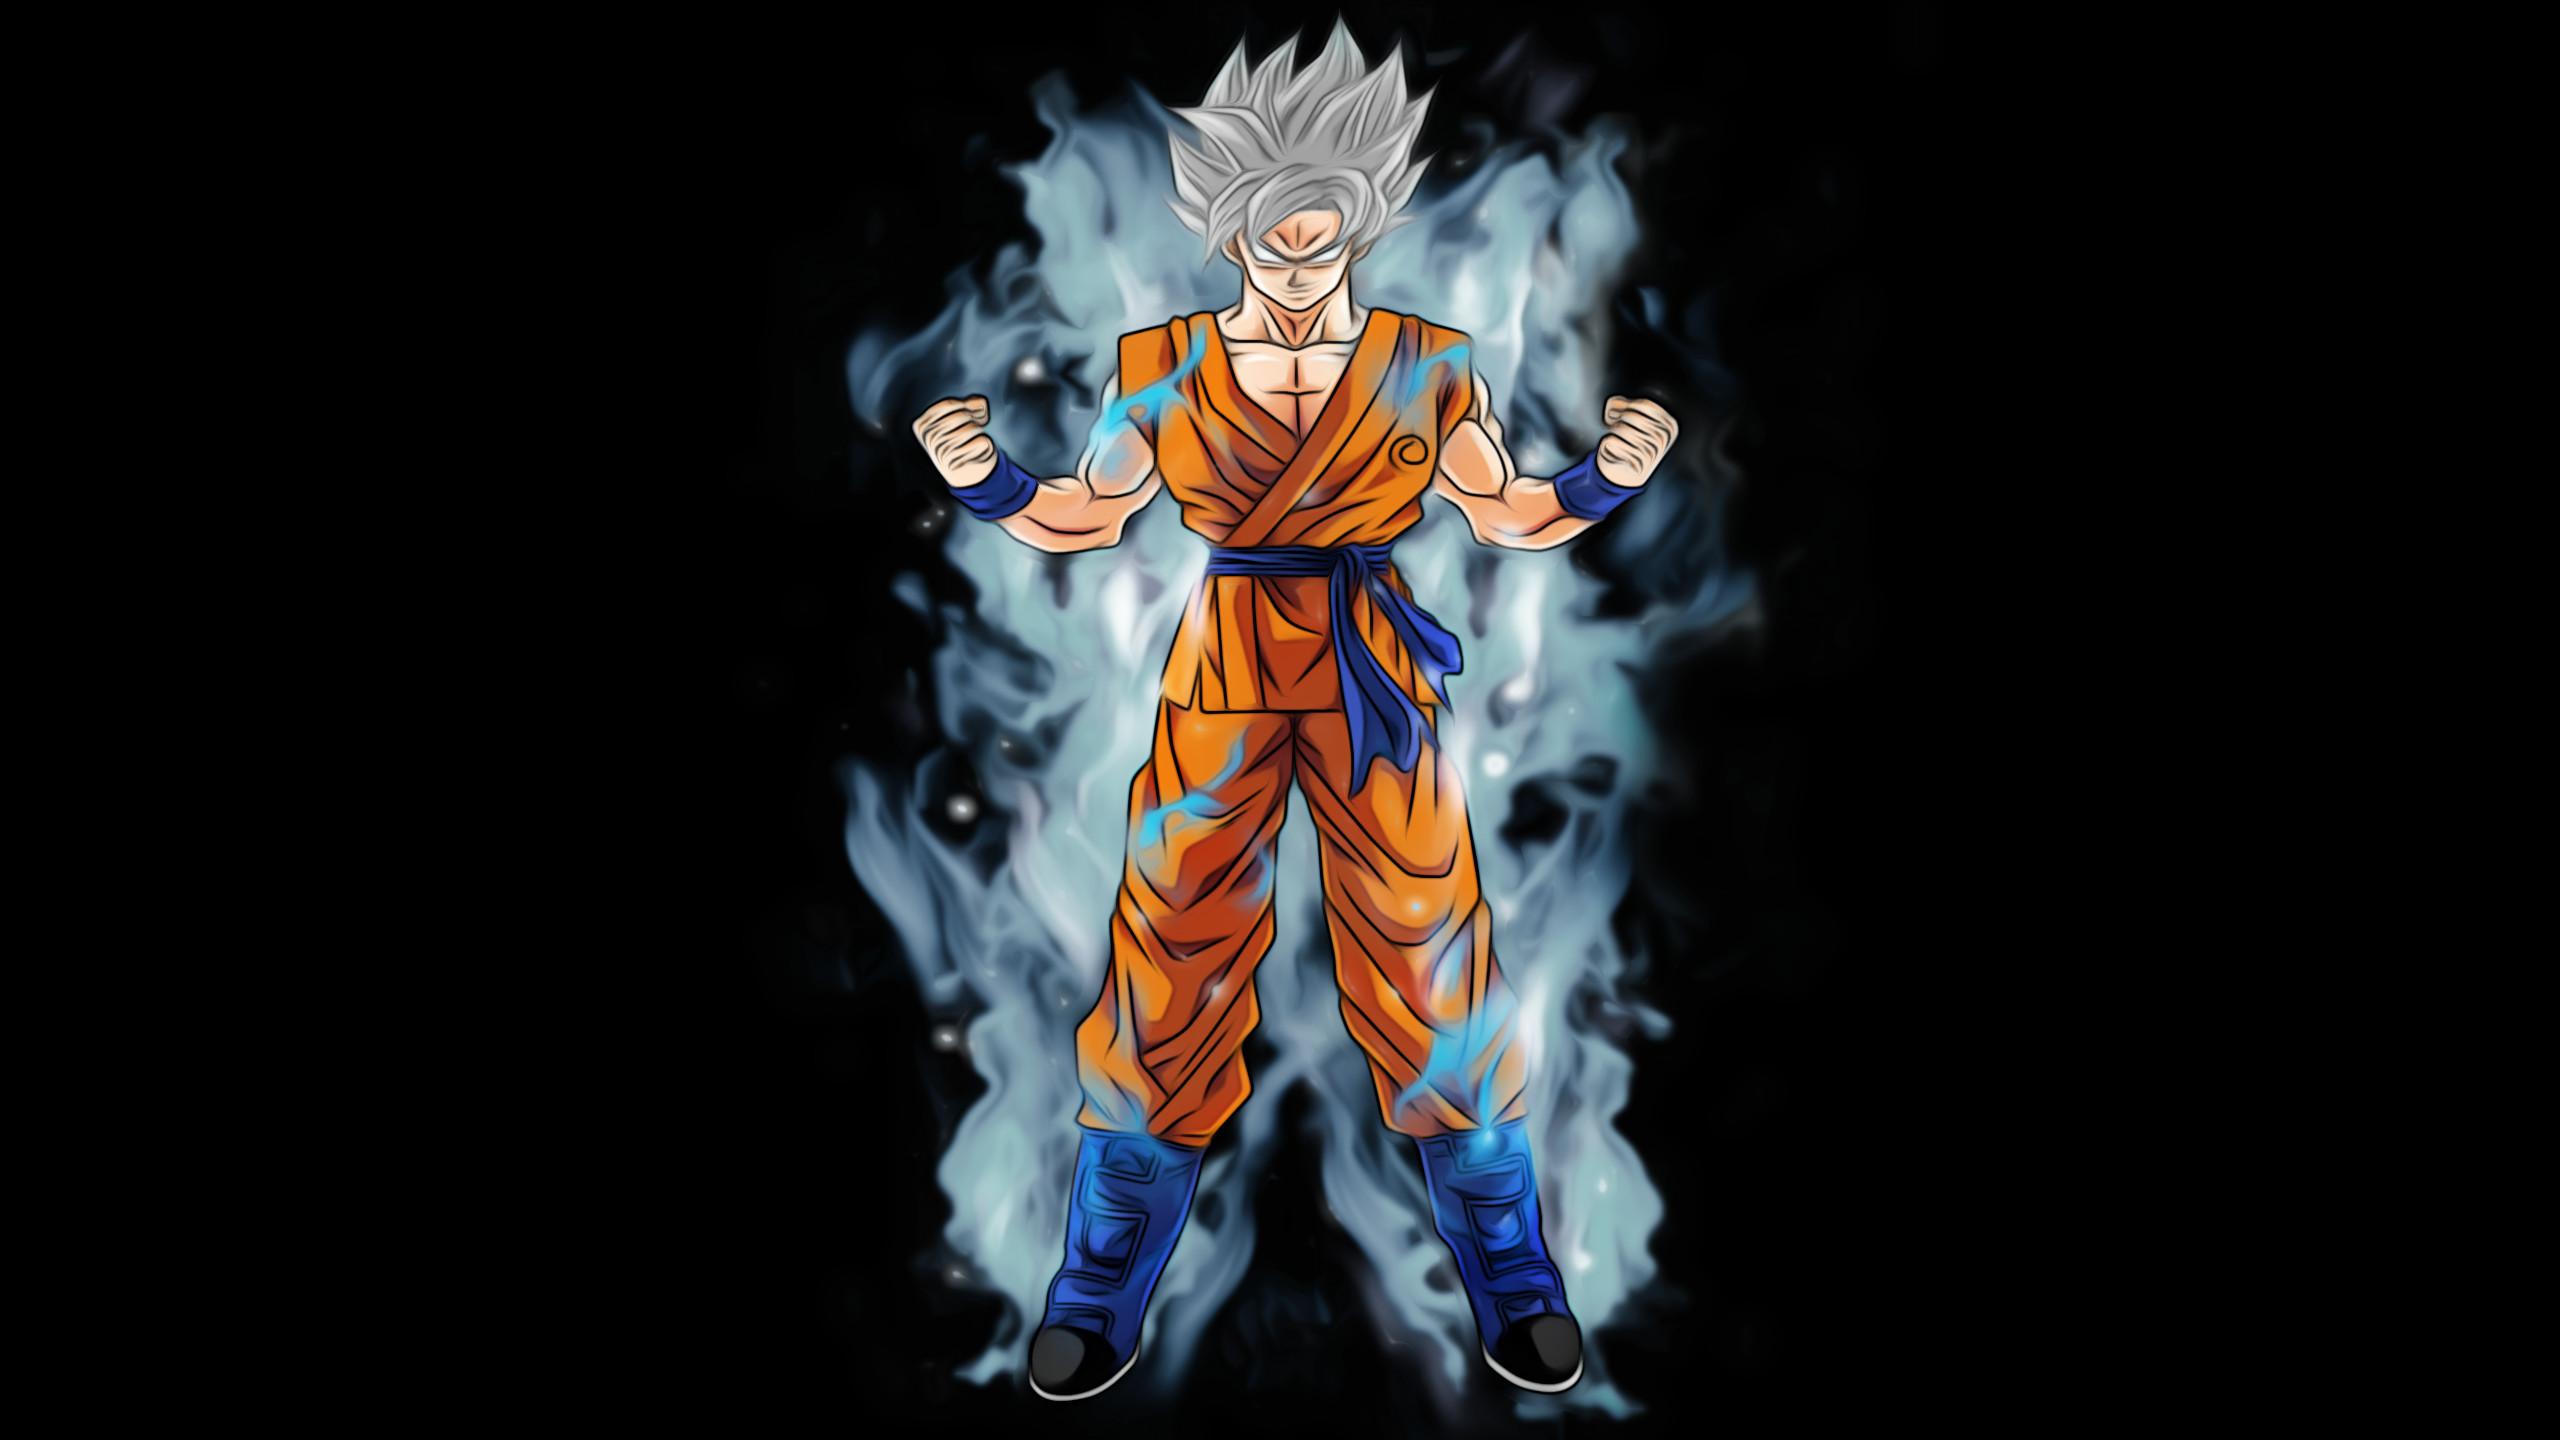 My Hero Academia Wallpaper Iphone X Goku Super Saiyan Wallpaper 72 Images